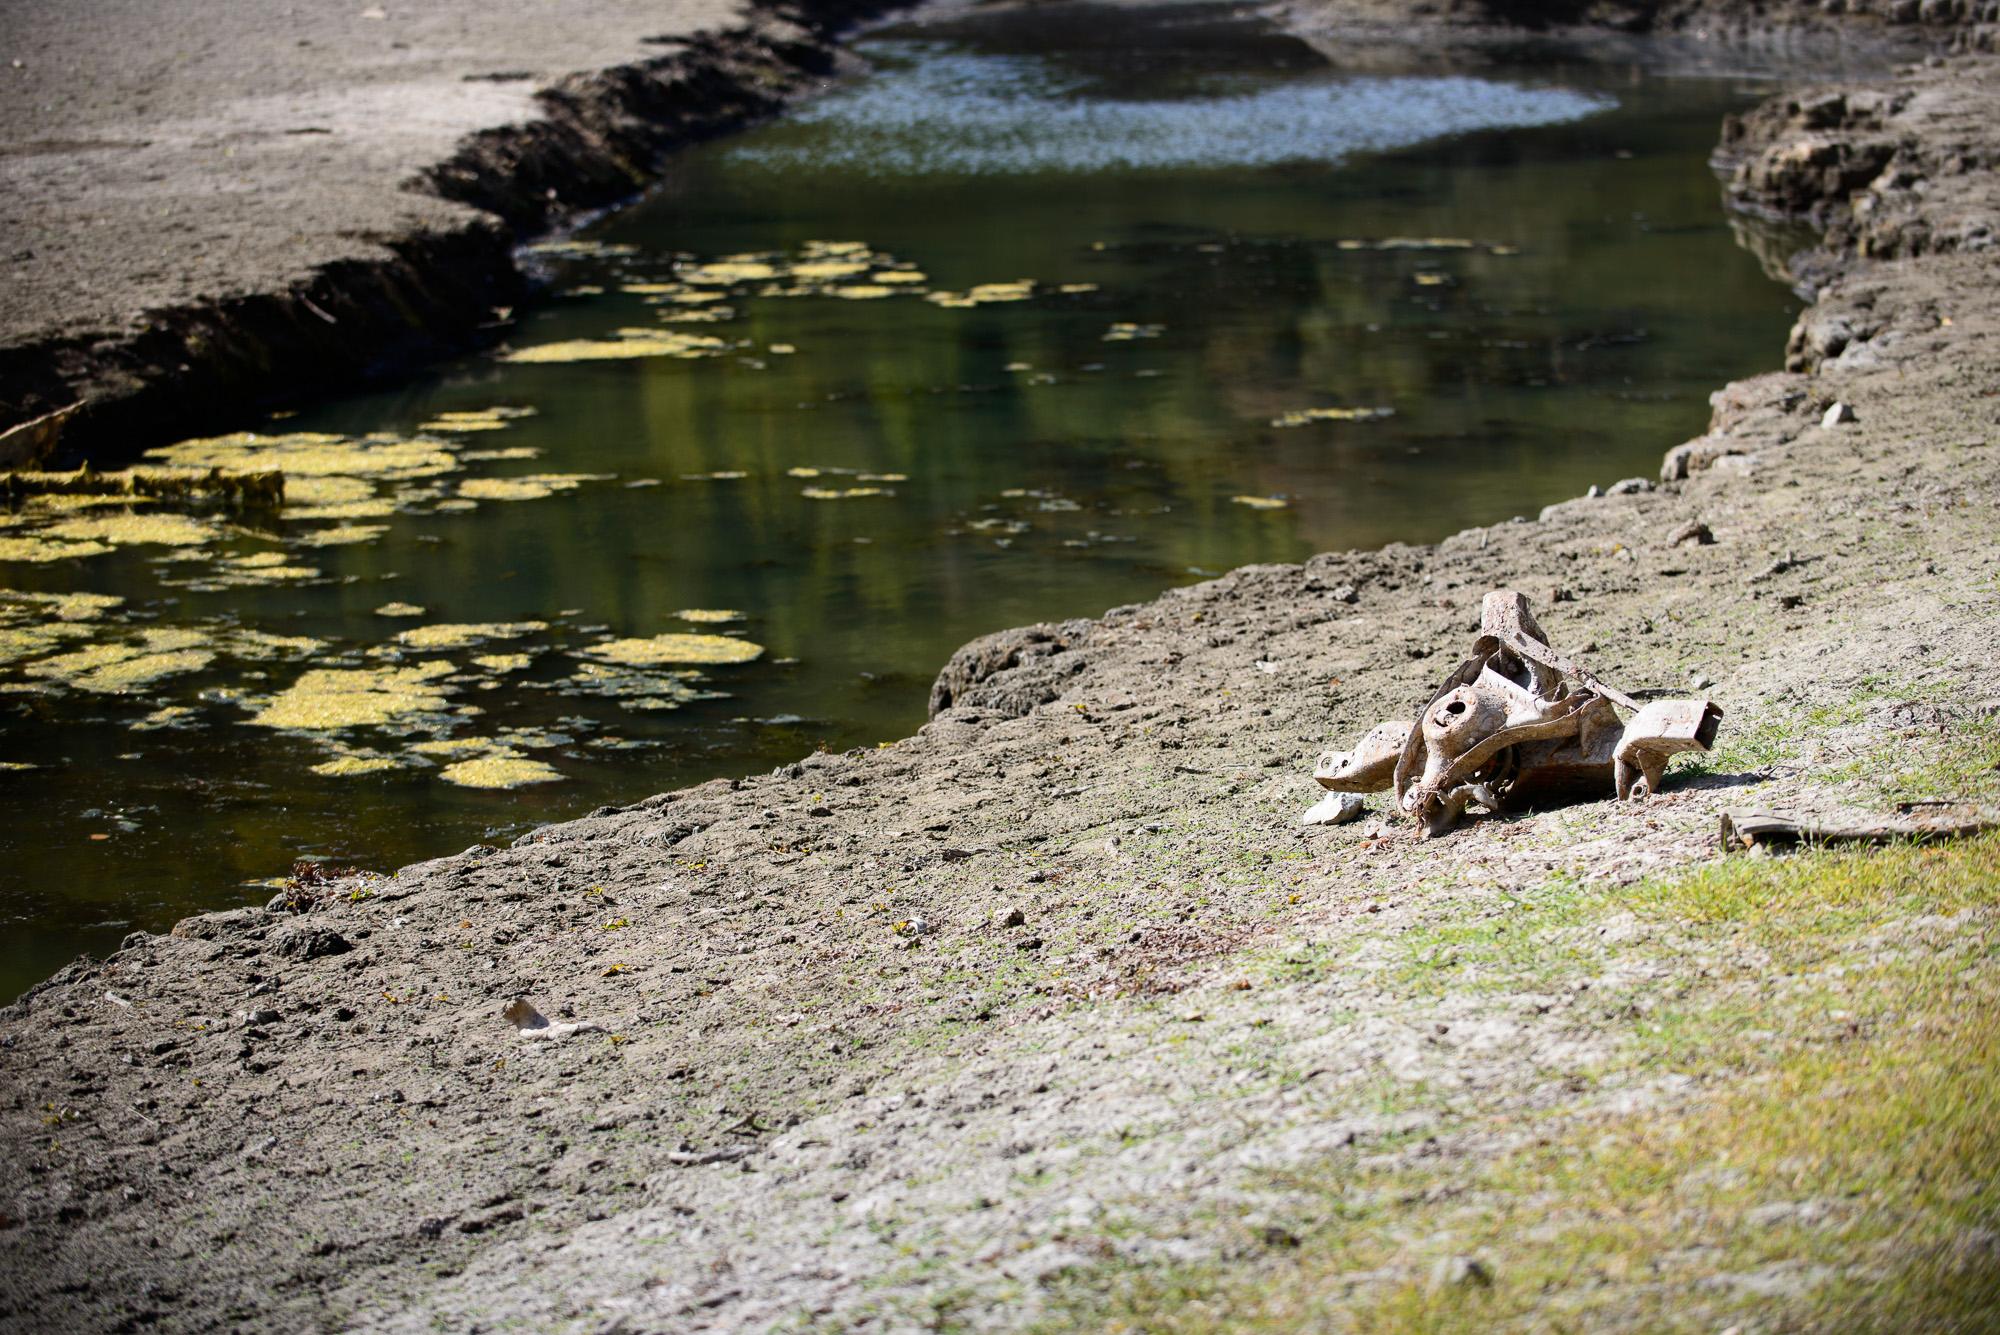 almaden_reservoir_drought_brittany_app.jpg